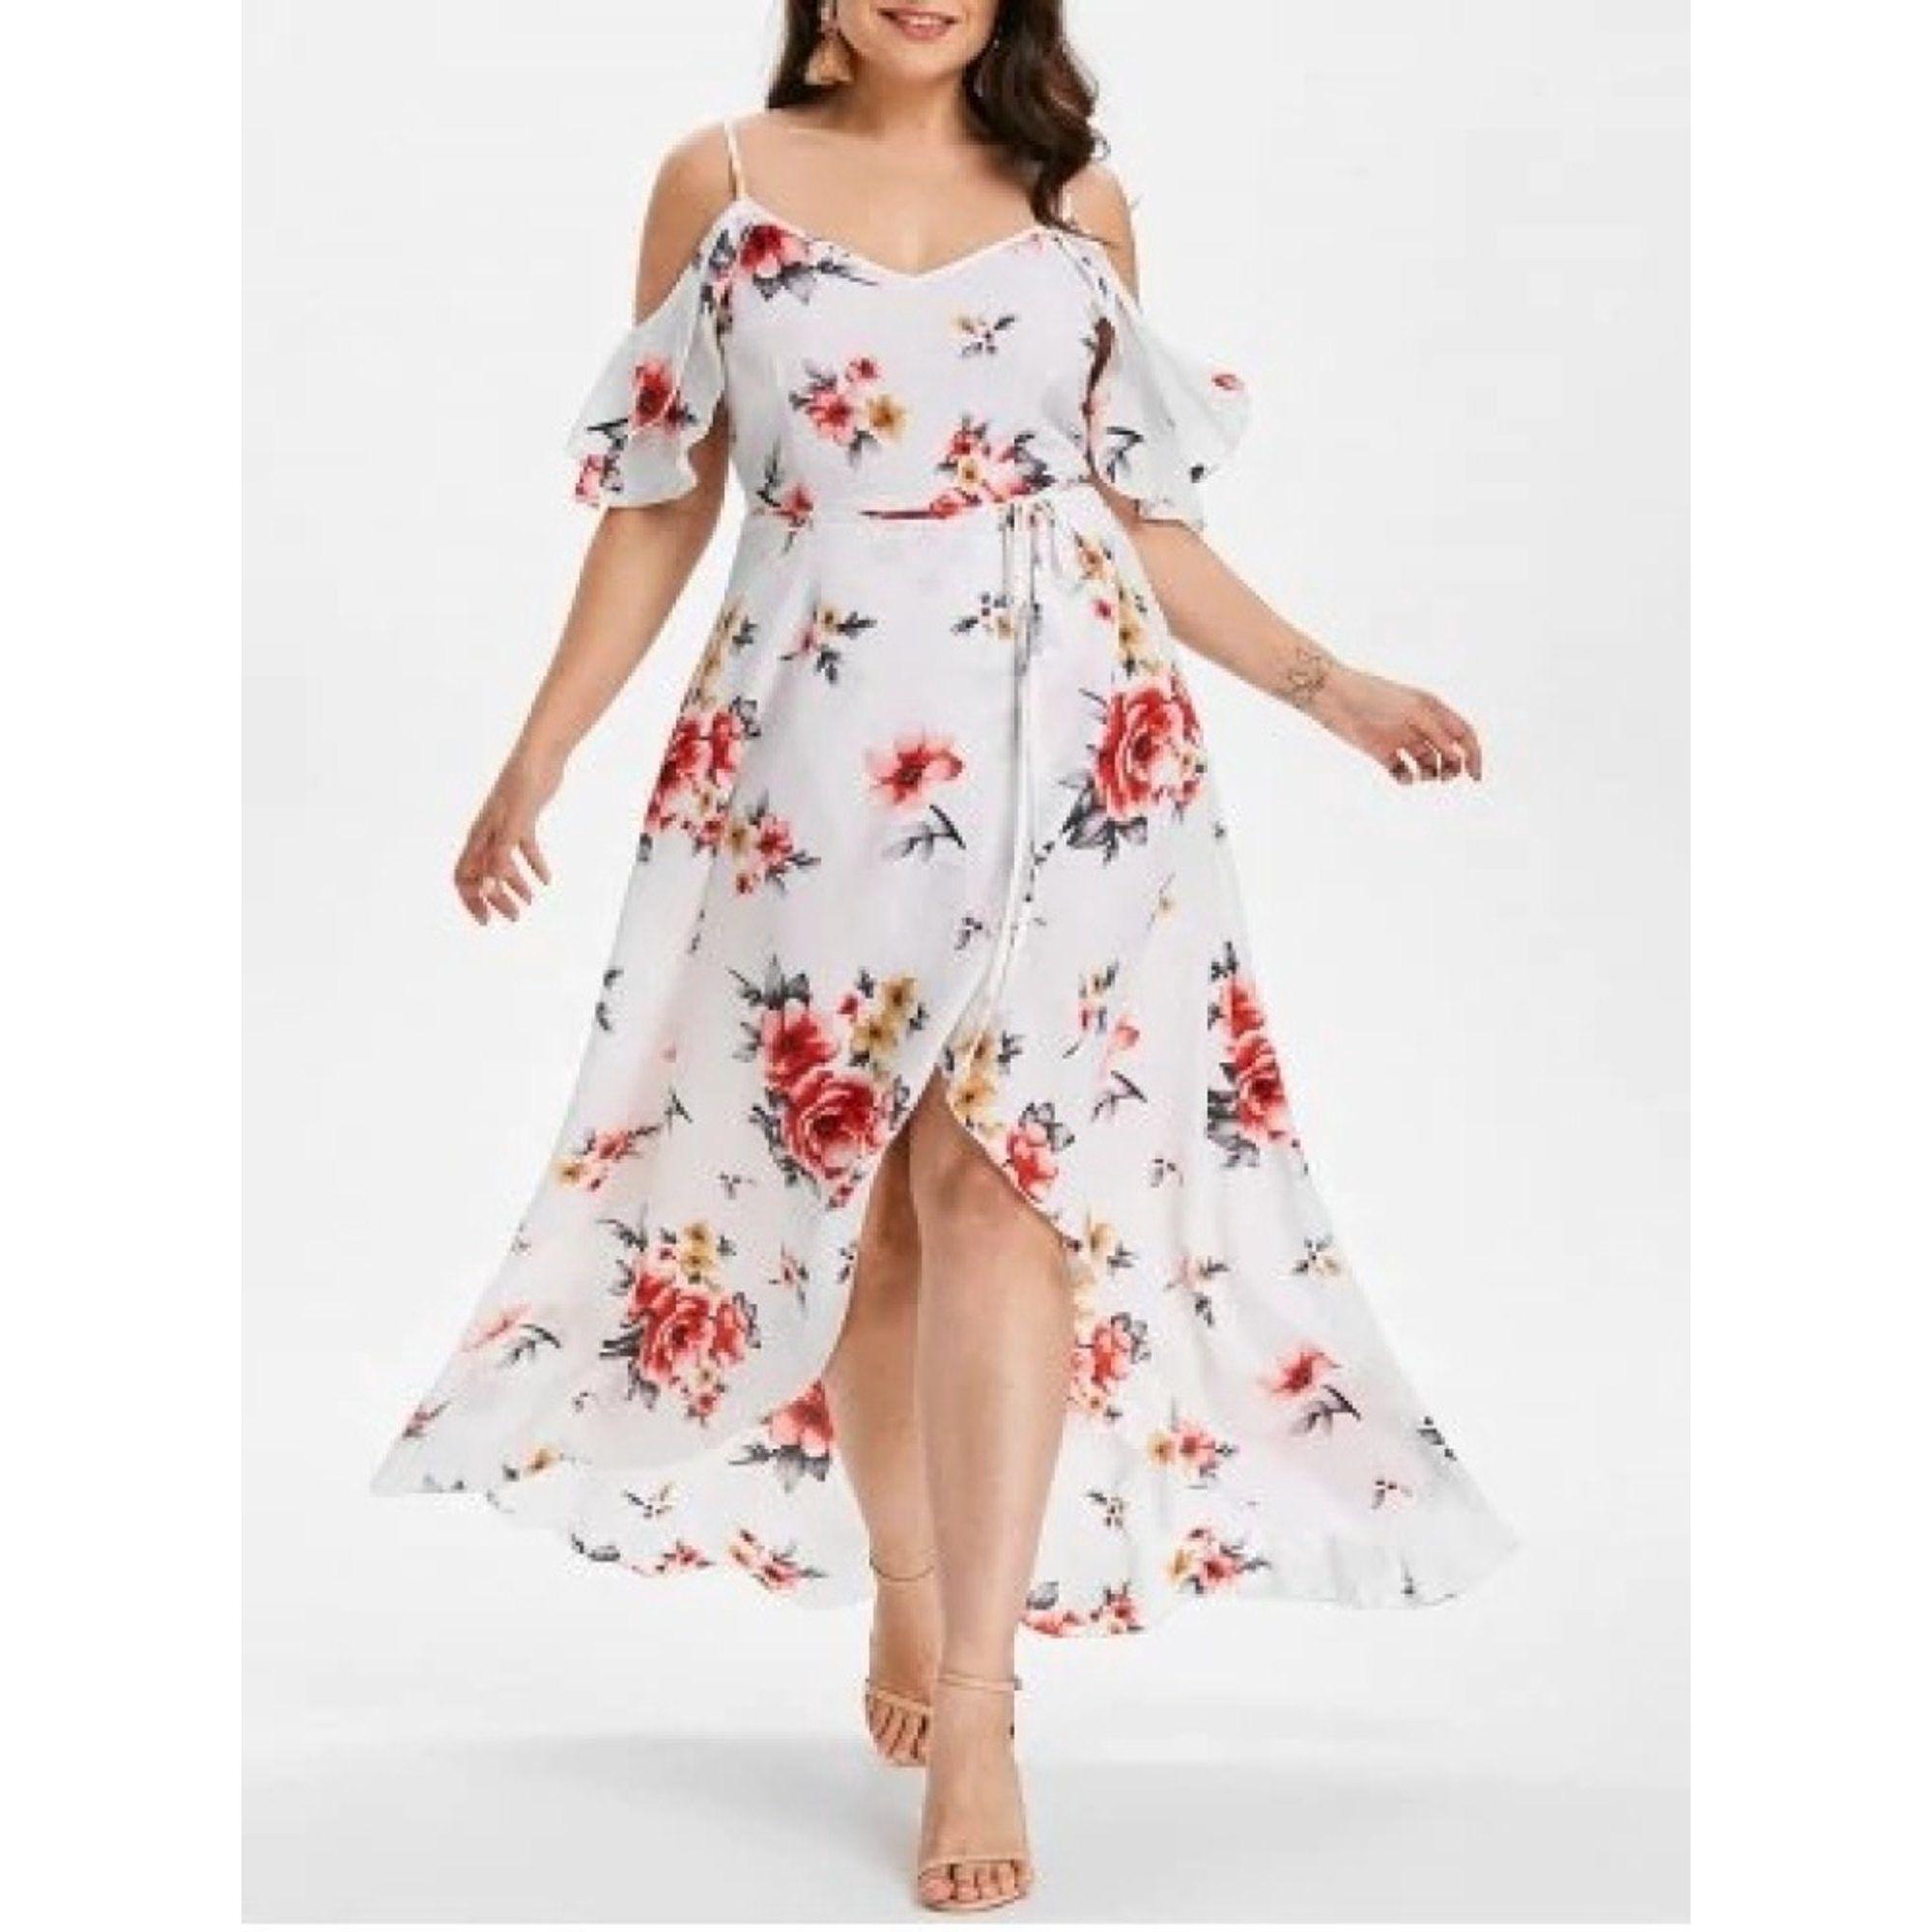 Sysea Plus Size Women Print Spaghetti Strap Chiffon Dress Walmart Com Cold Shoulder Maxi Dress Flower Print Long Dress Plus Size Maxi Dresses [ 2000 x 2000 Pixel ]